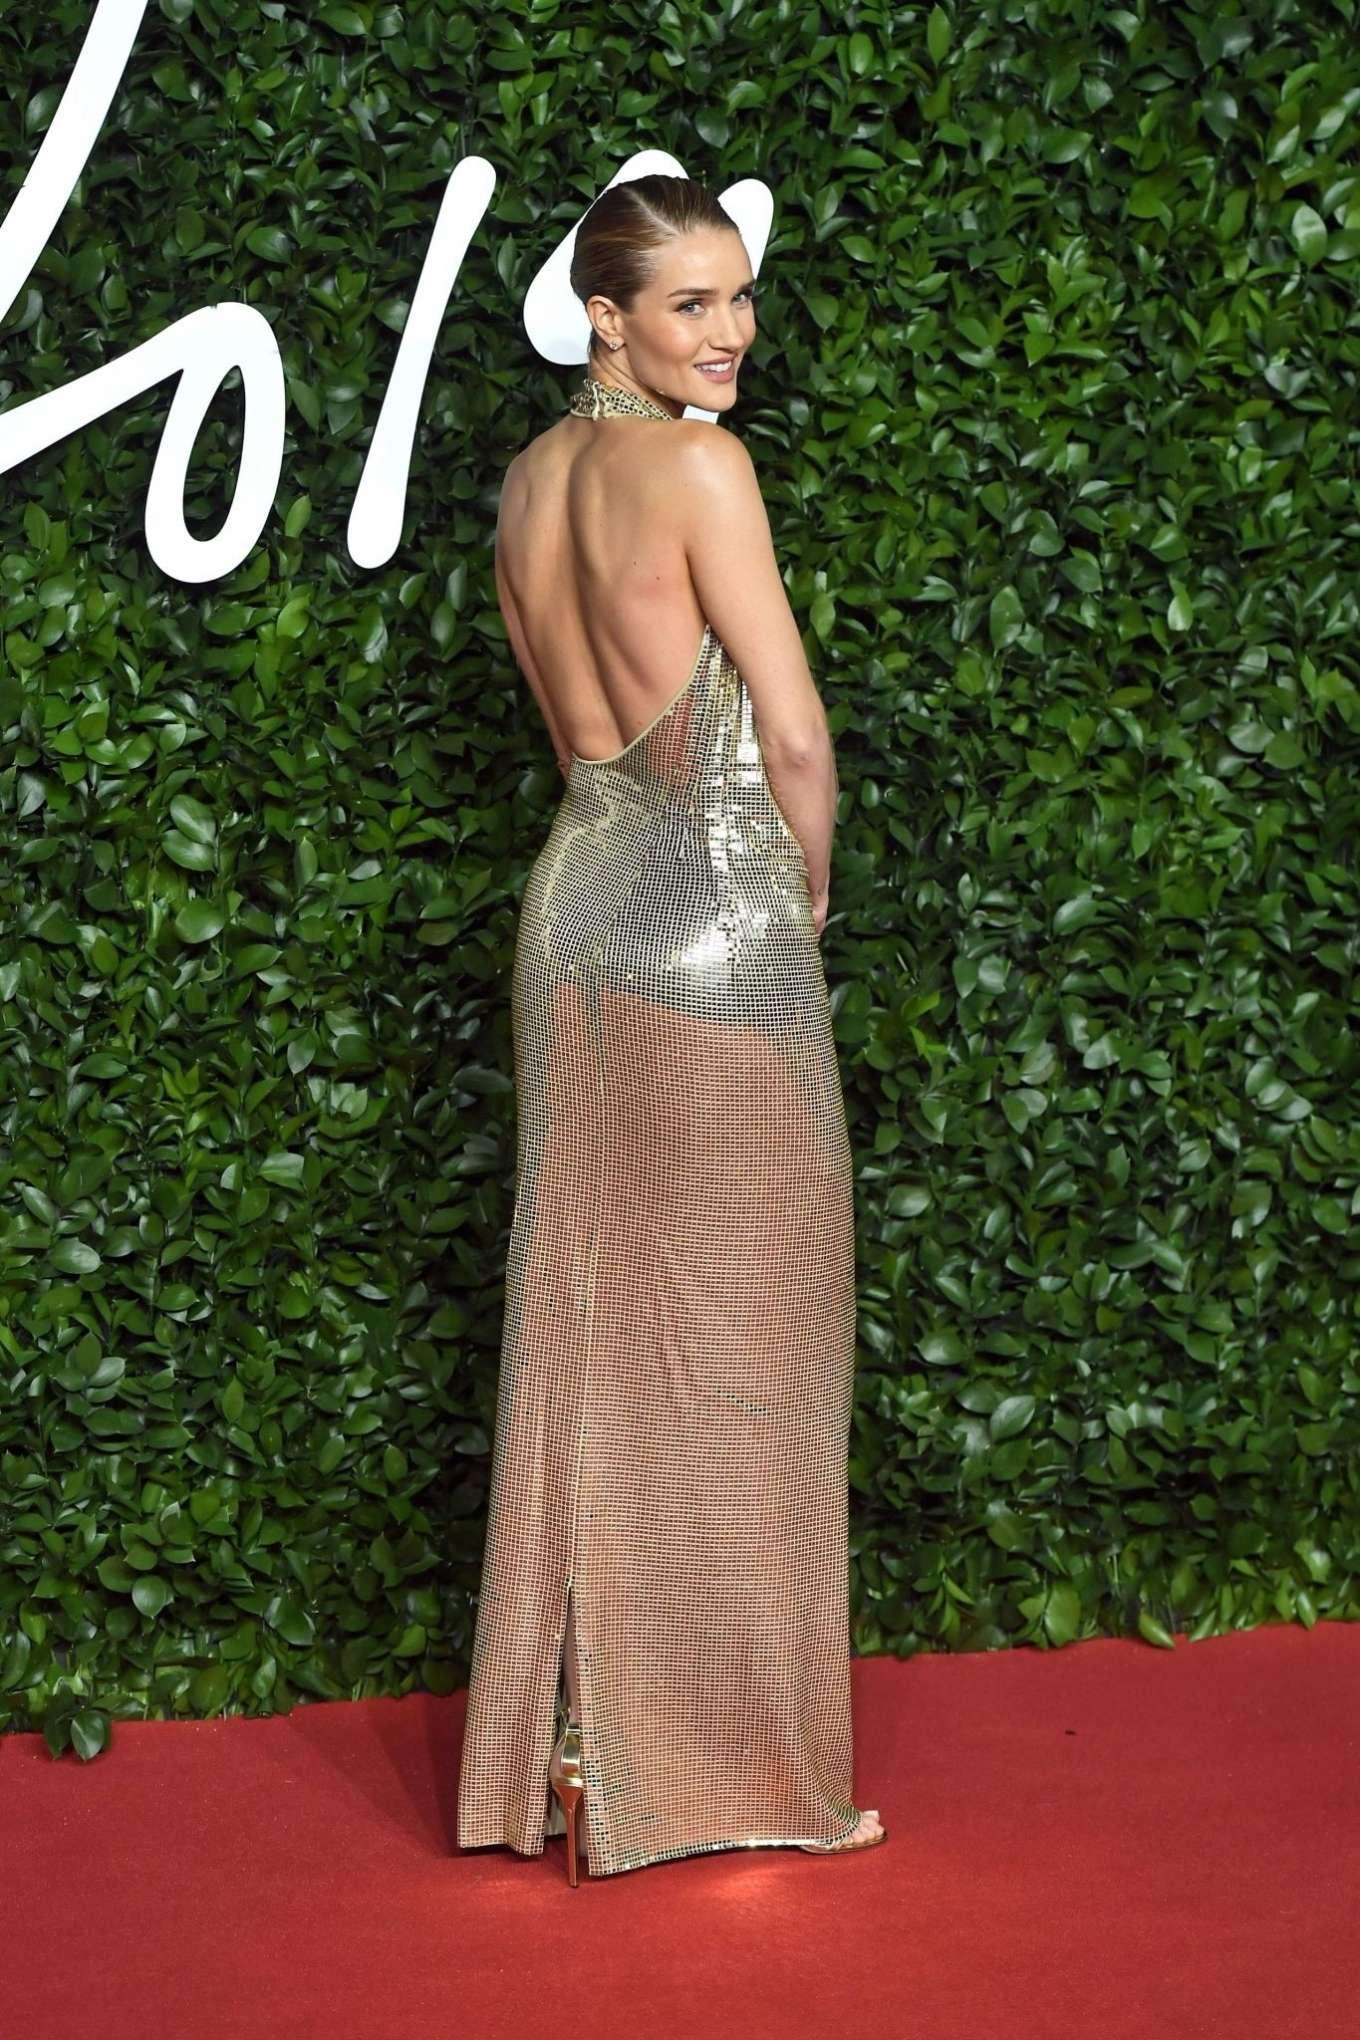 Rosie Hungtington Whiteley 2019 : Rosie Hungtington Whiteley – Fashion Awards 2019 in London-11